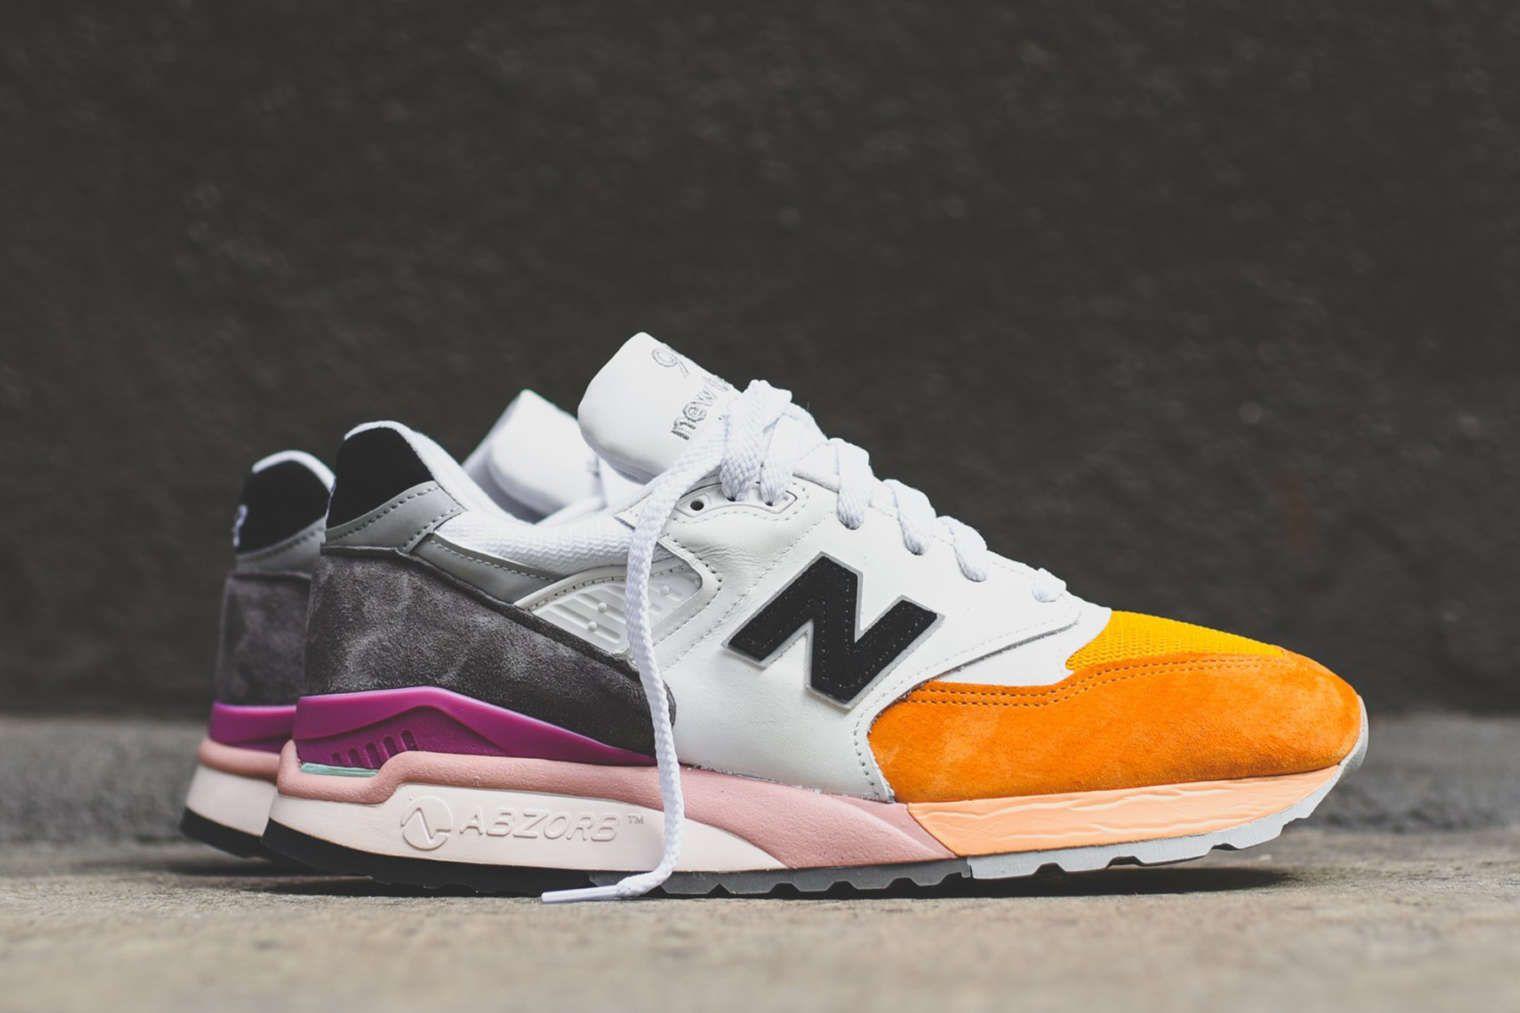 New Balance 998 in Orange \u0026 Berry | New